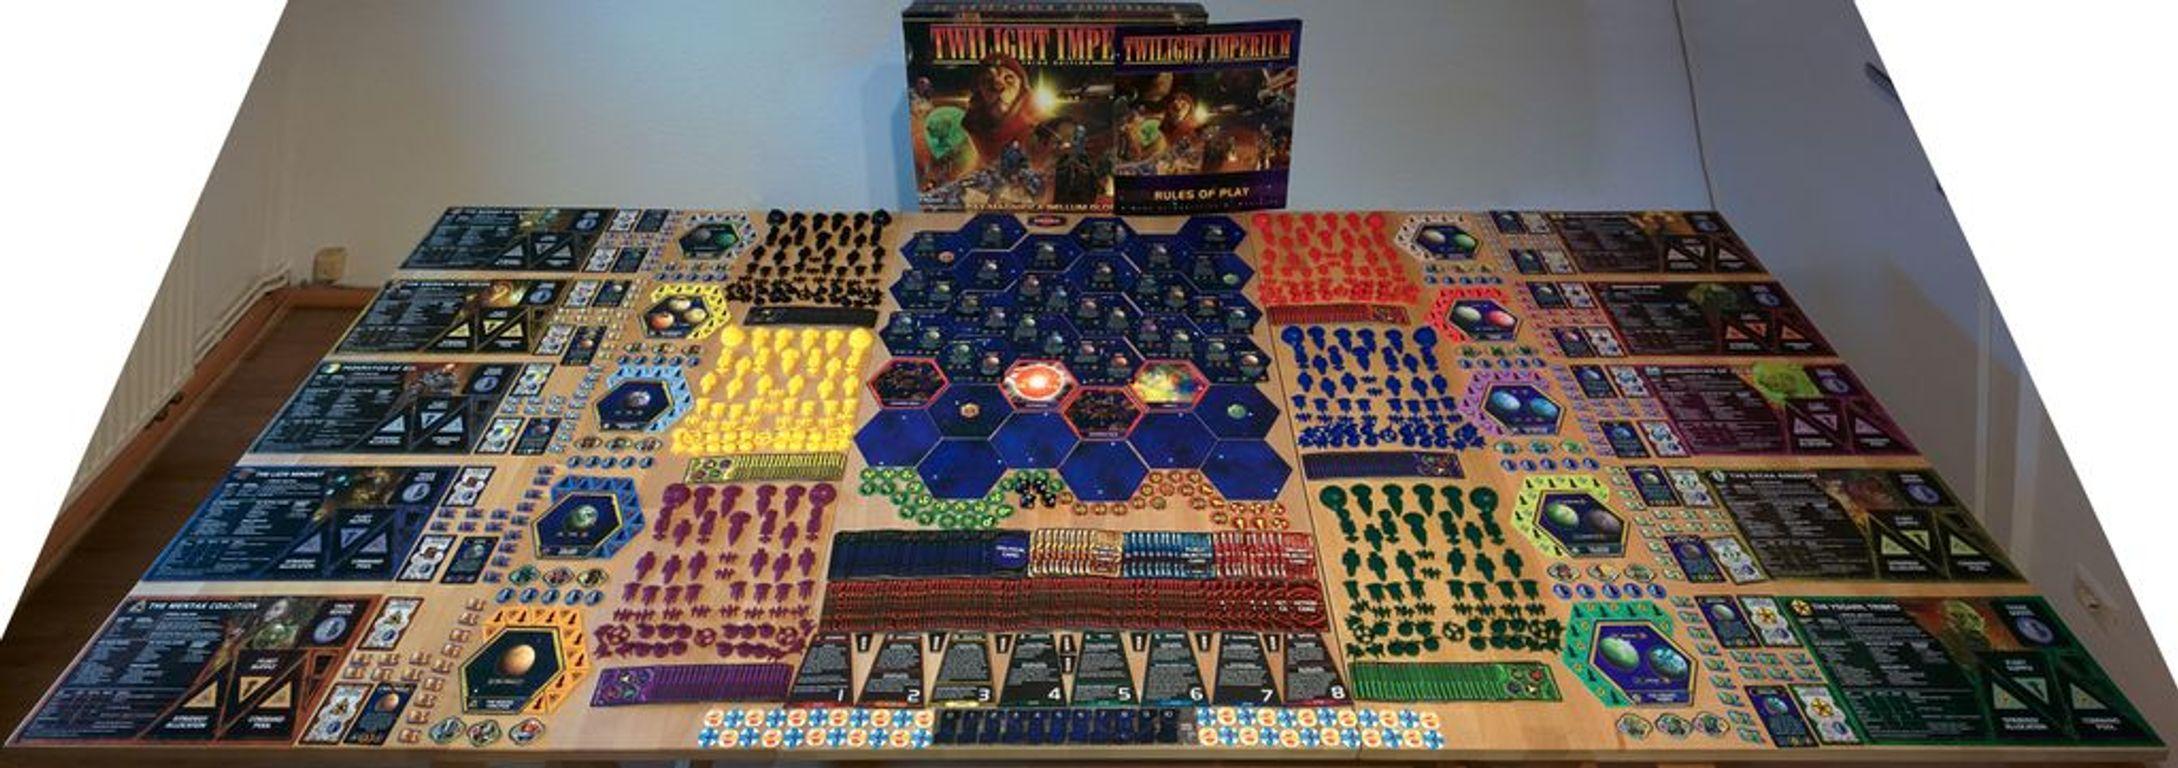 Twilight Imperium (Third Edition) components